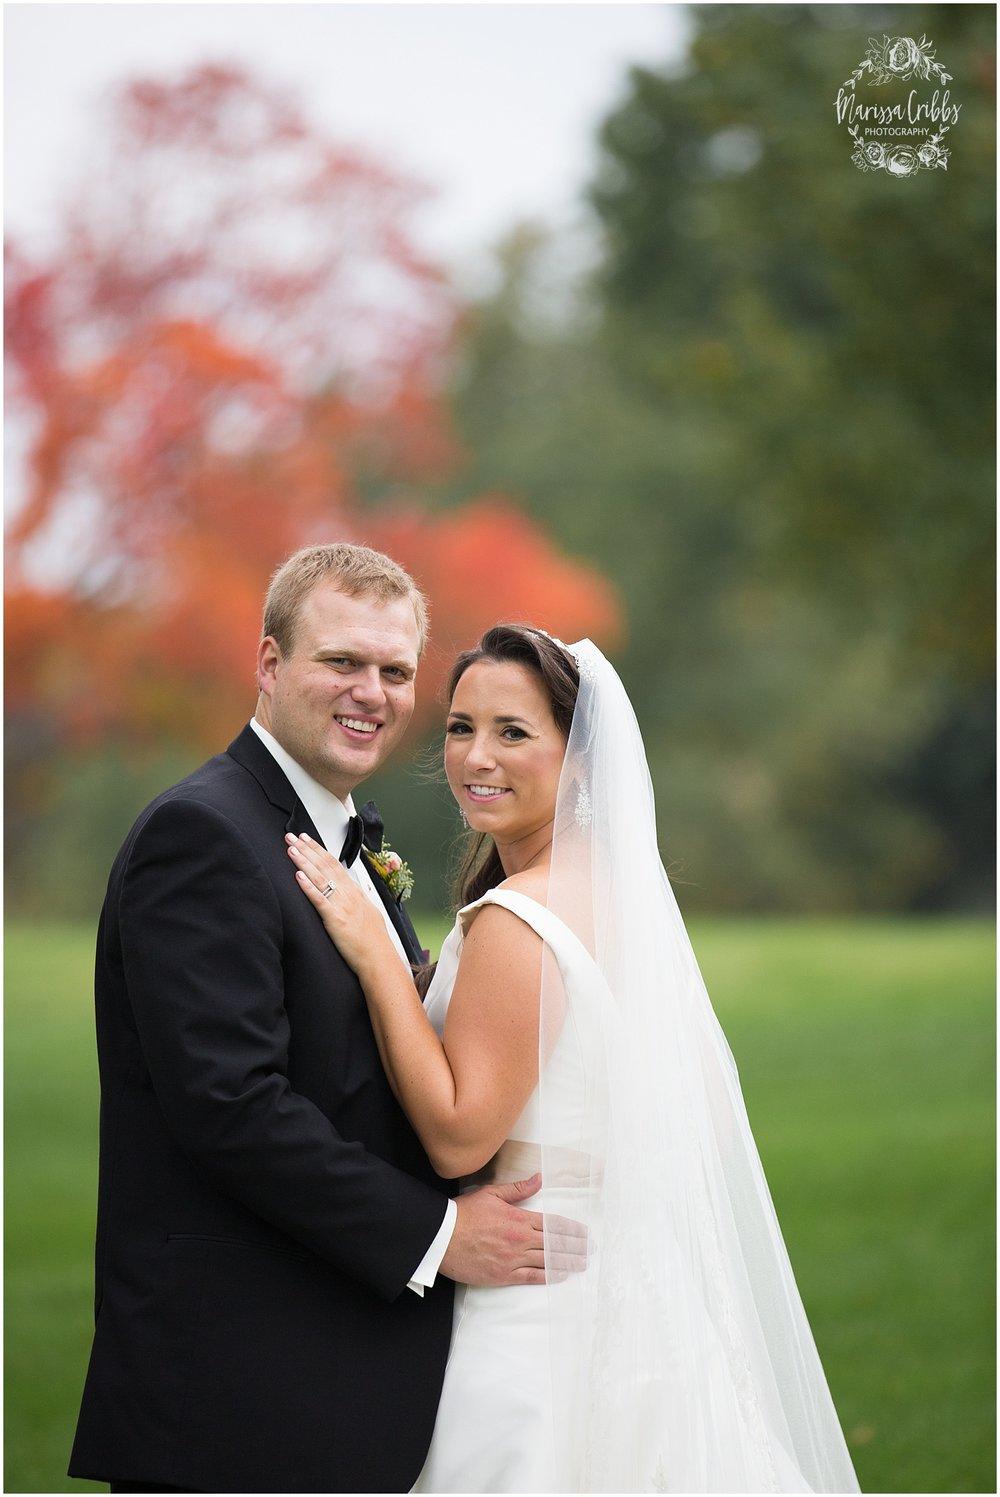 Blue Hills Country Club Wedding | Marissa Cribbs Photography | Nolte's Bridal | KC Wedding Photographer | KC Weddings_1172.jpg